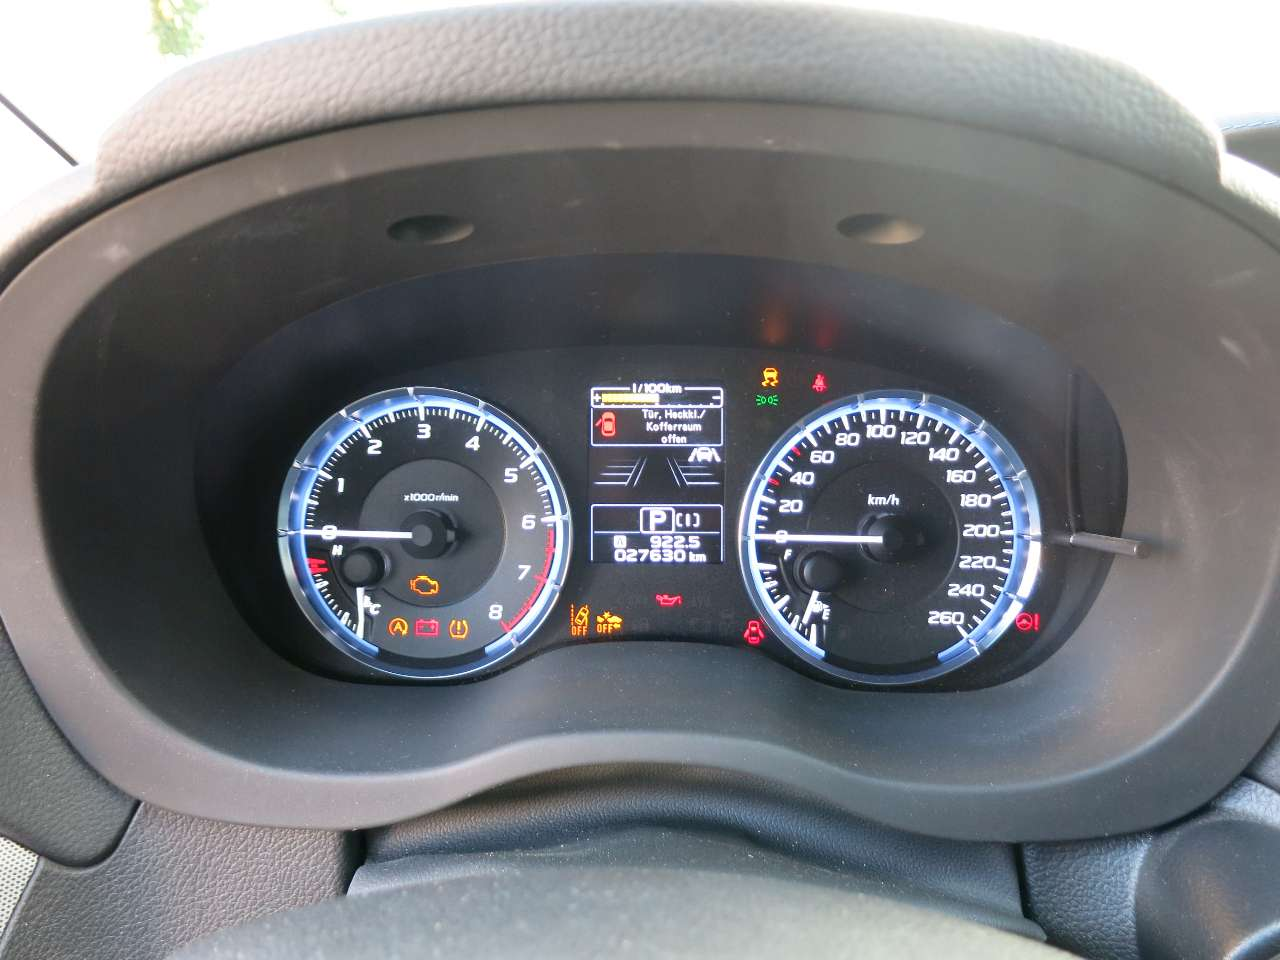 Sport 4x4 (V10) LED 360° KAMERA ACC SPURASSIST